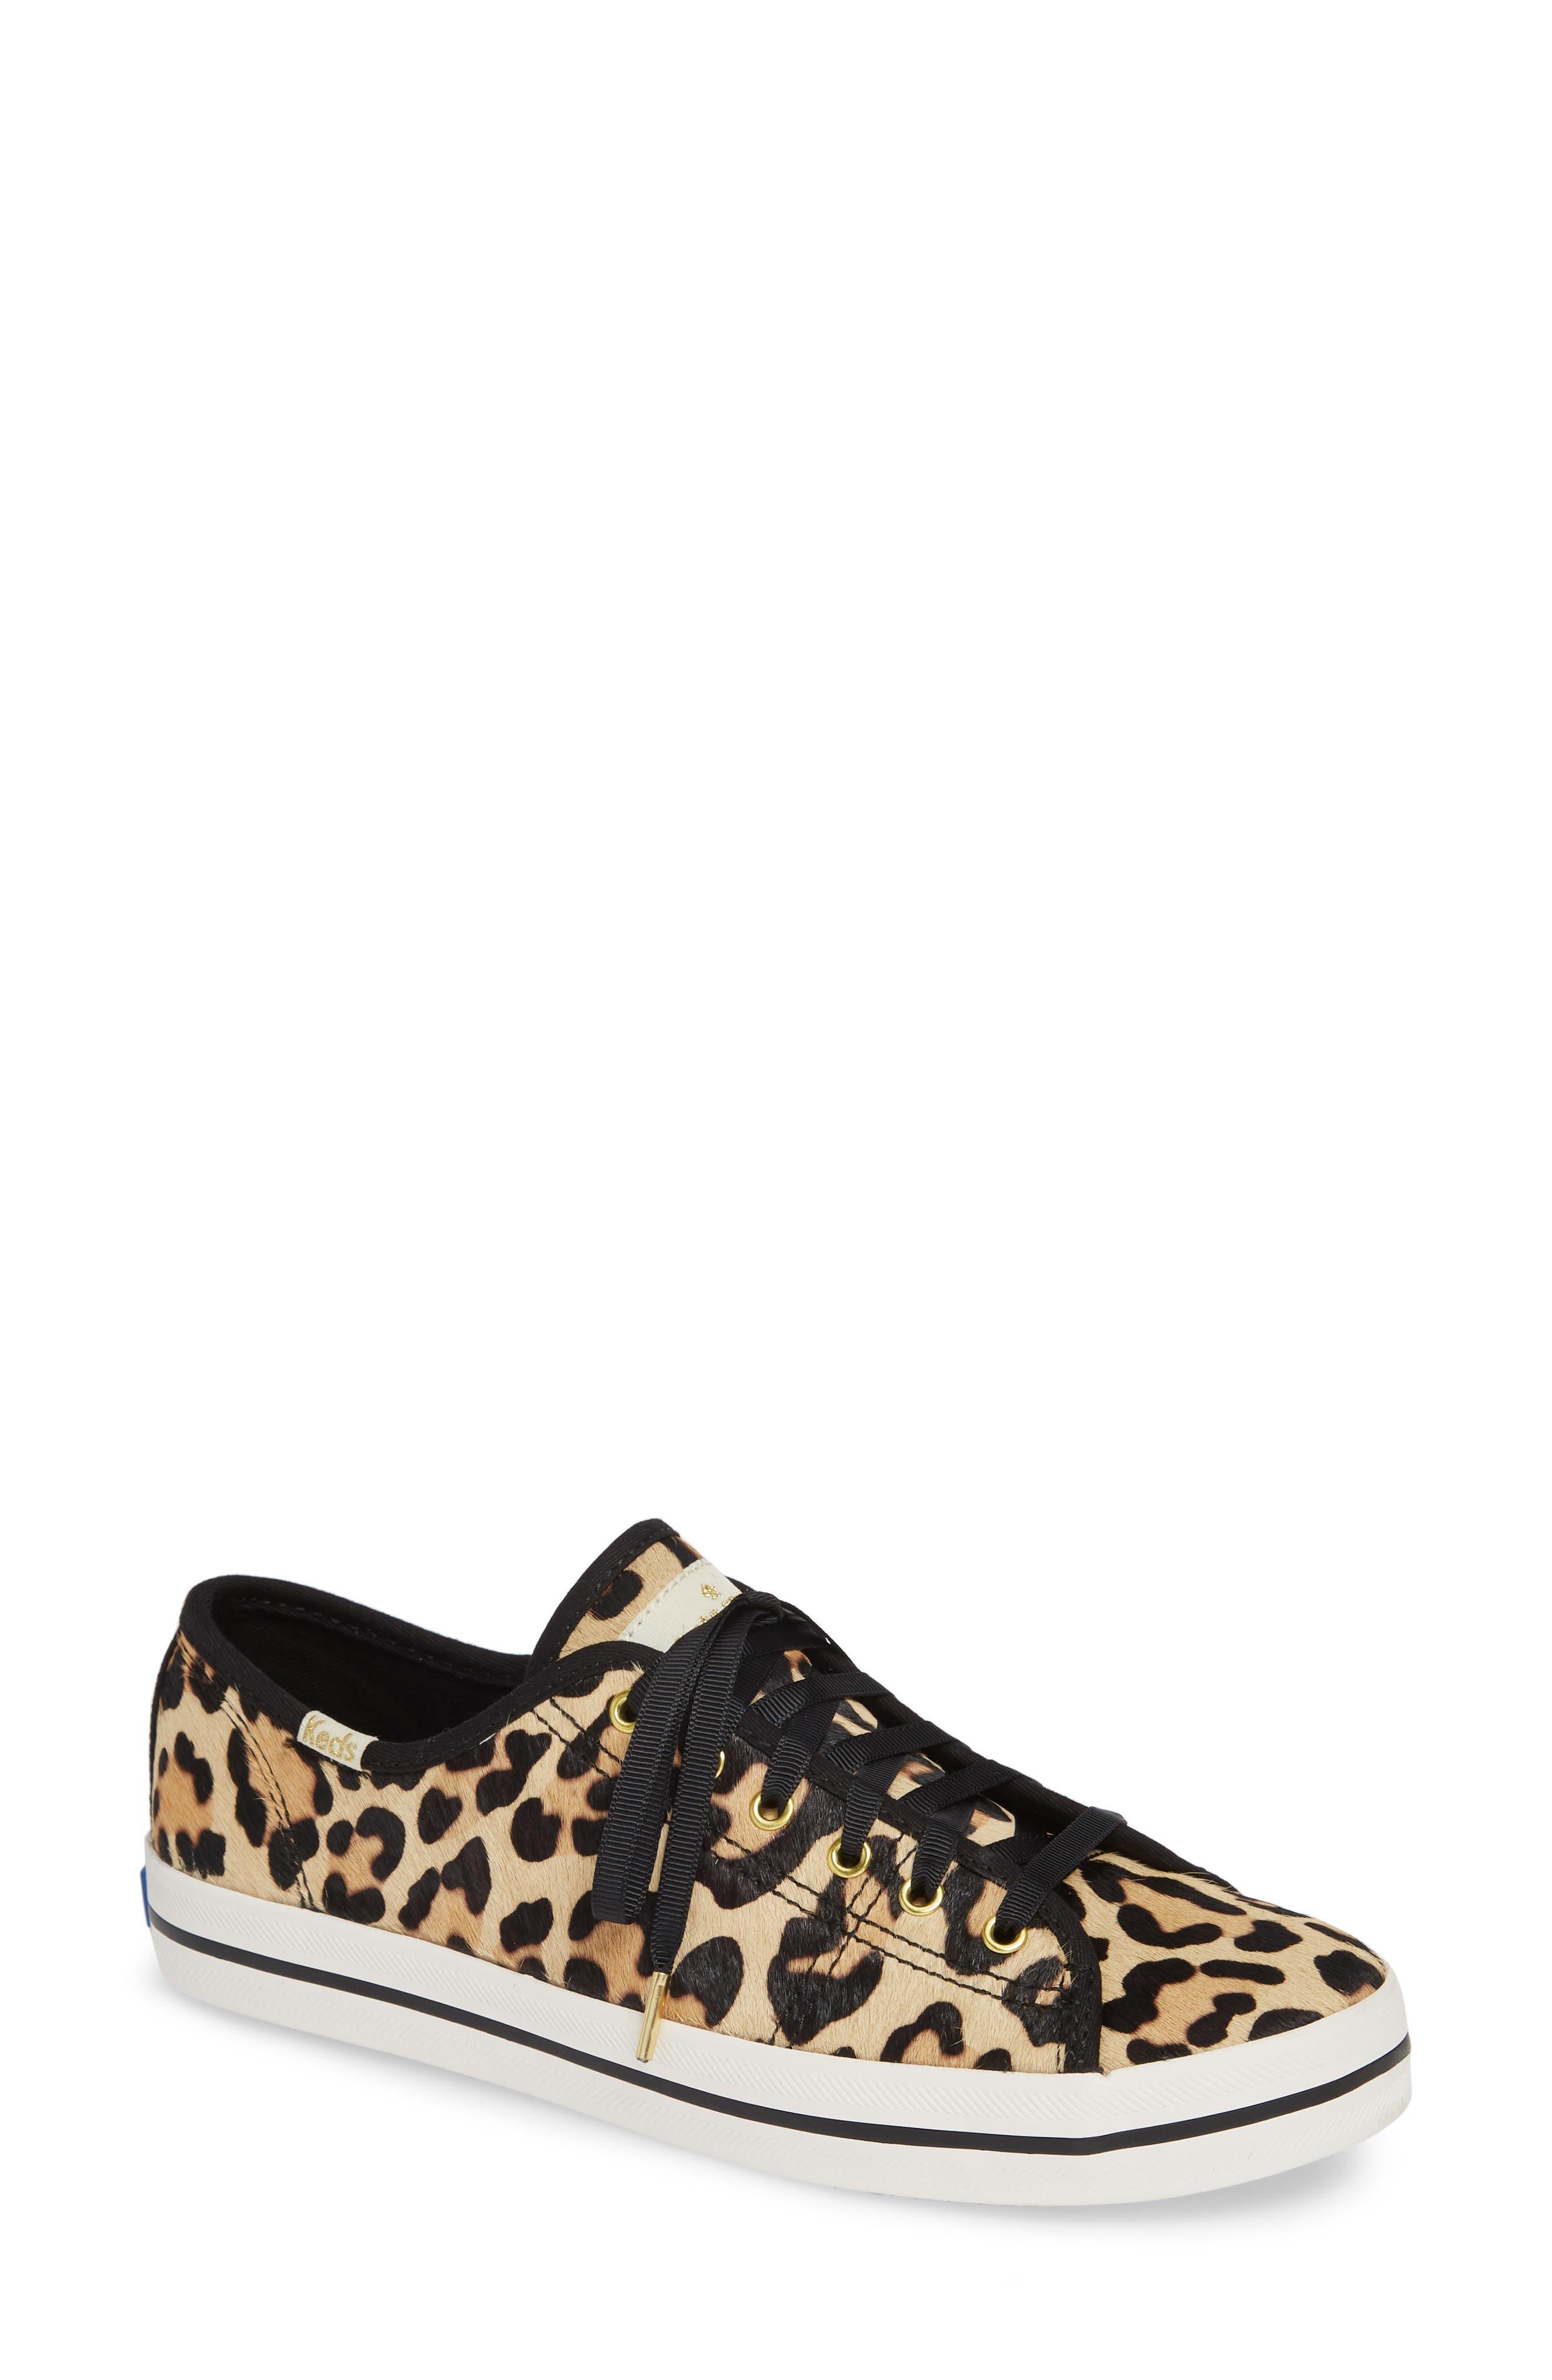 KEDS<SUP>®</SUP> FOR KATE SPADE NEW YORK kickstart genuine calf hair sneaker, Main, color, TAN LEOPARD CALF HAIR